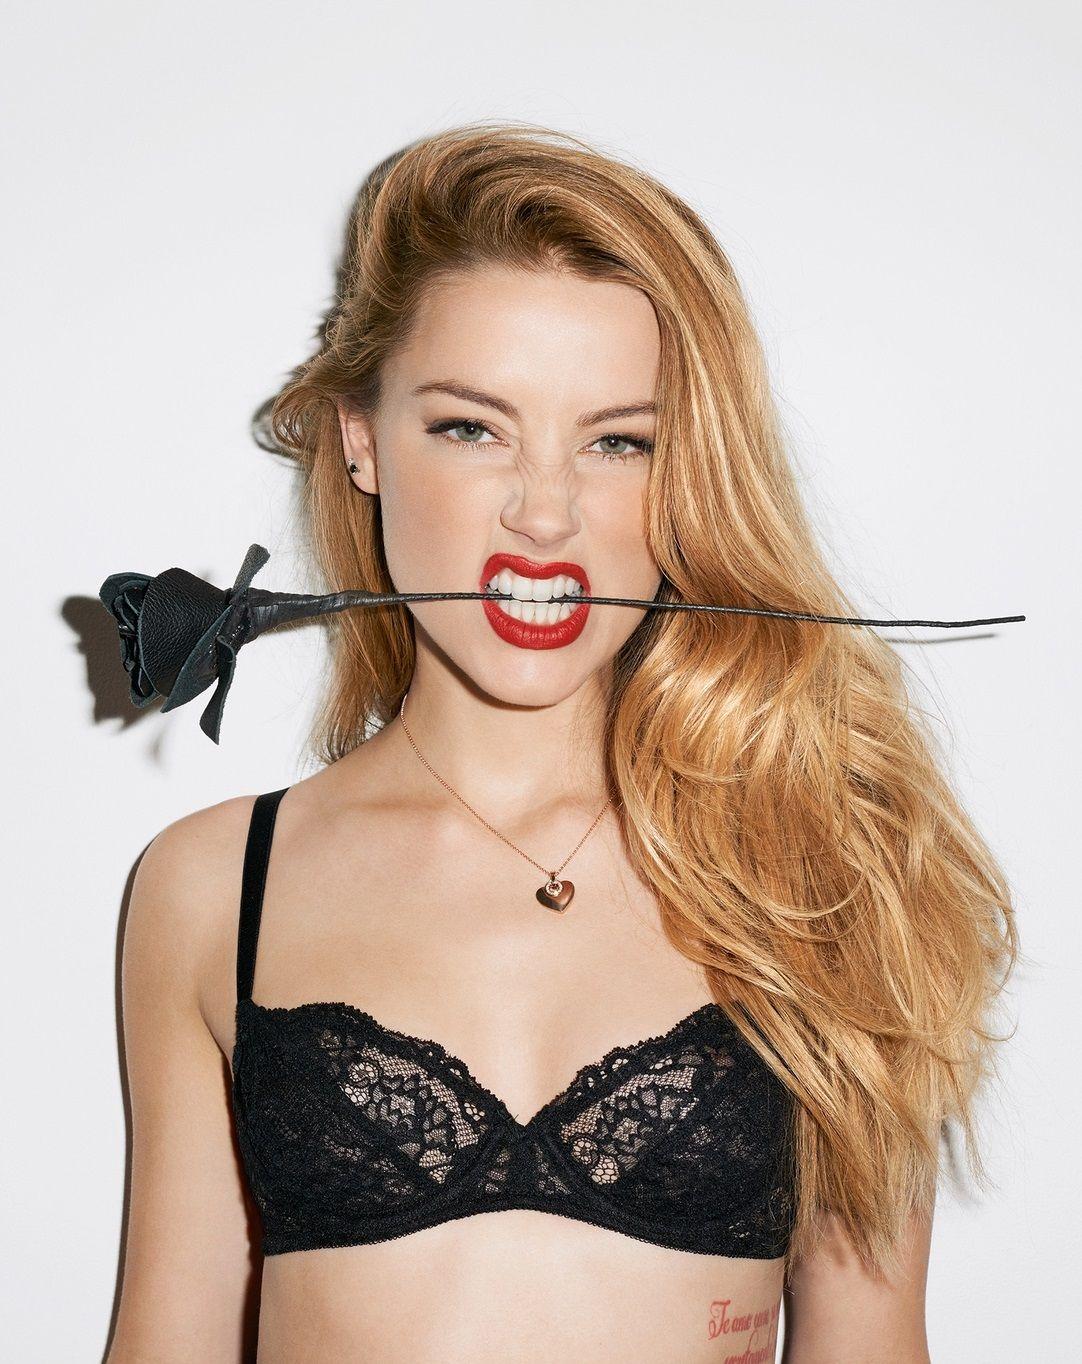 Amanda Heard Nude Pics amber heard - ideia de fotos - photography - red - lipstick